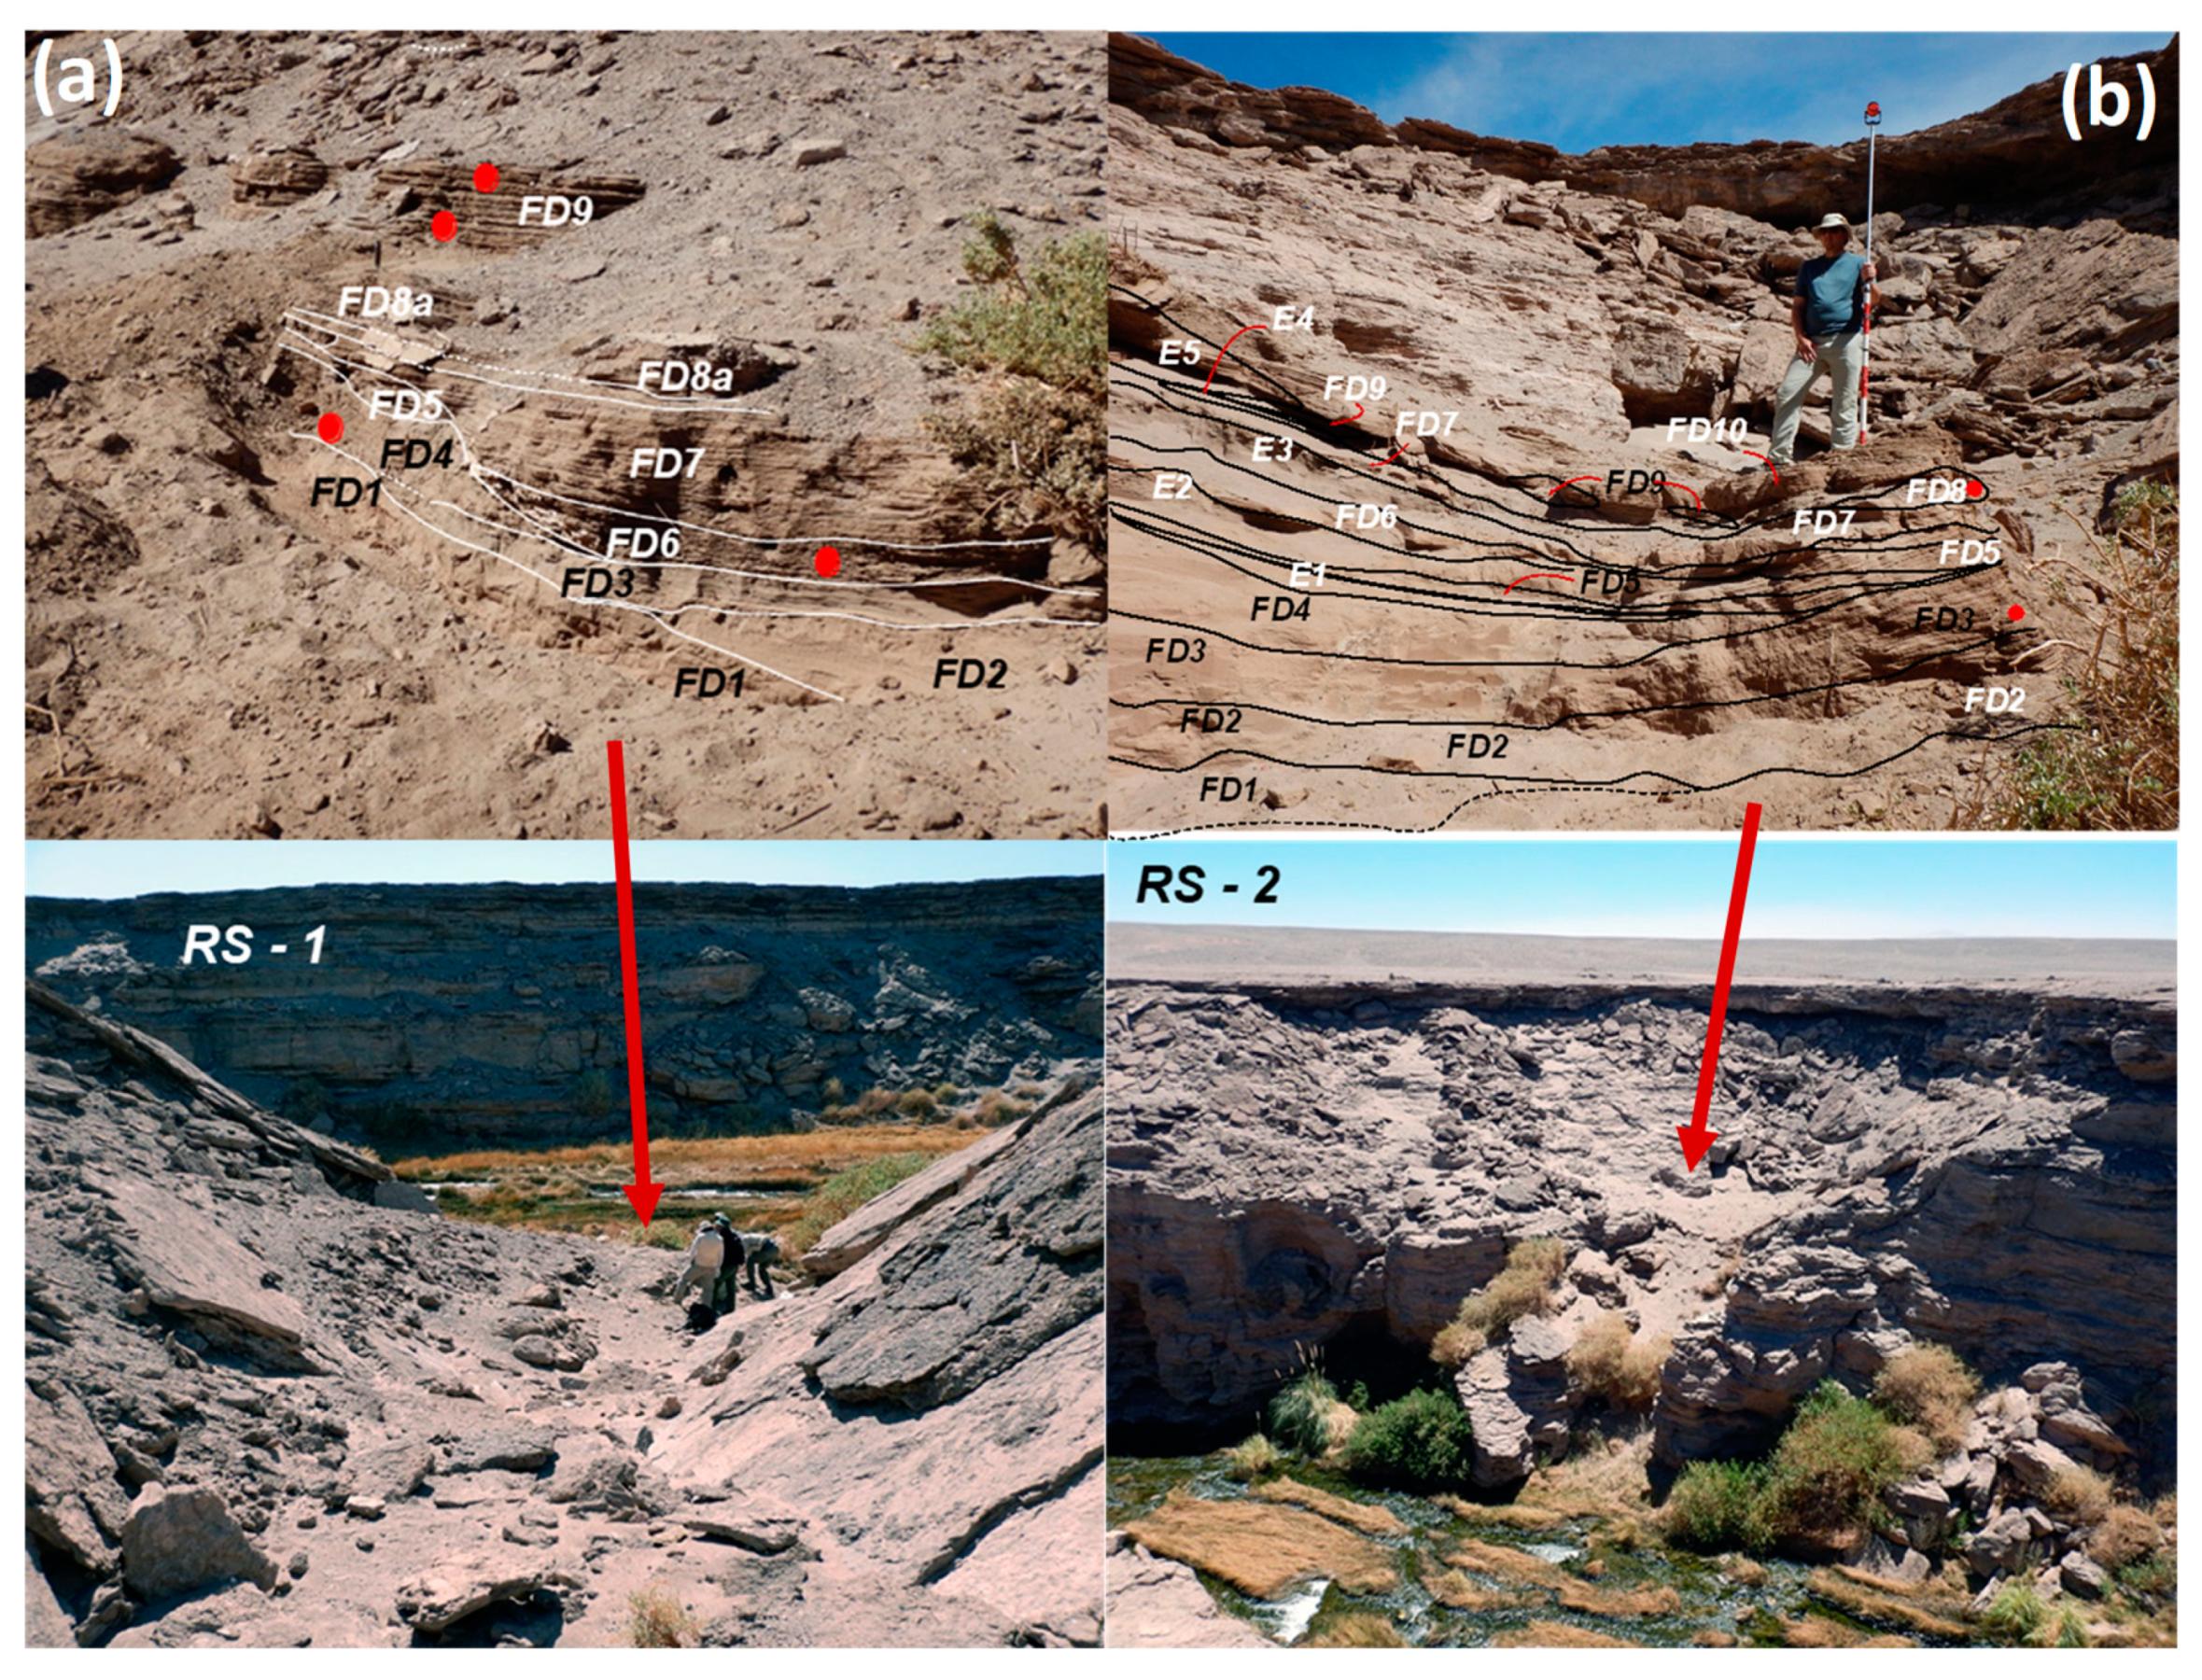 Geosciences | Free Full-Text | Use of Paleoflood Deposits to